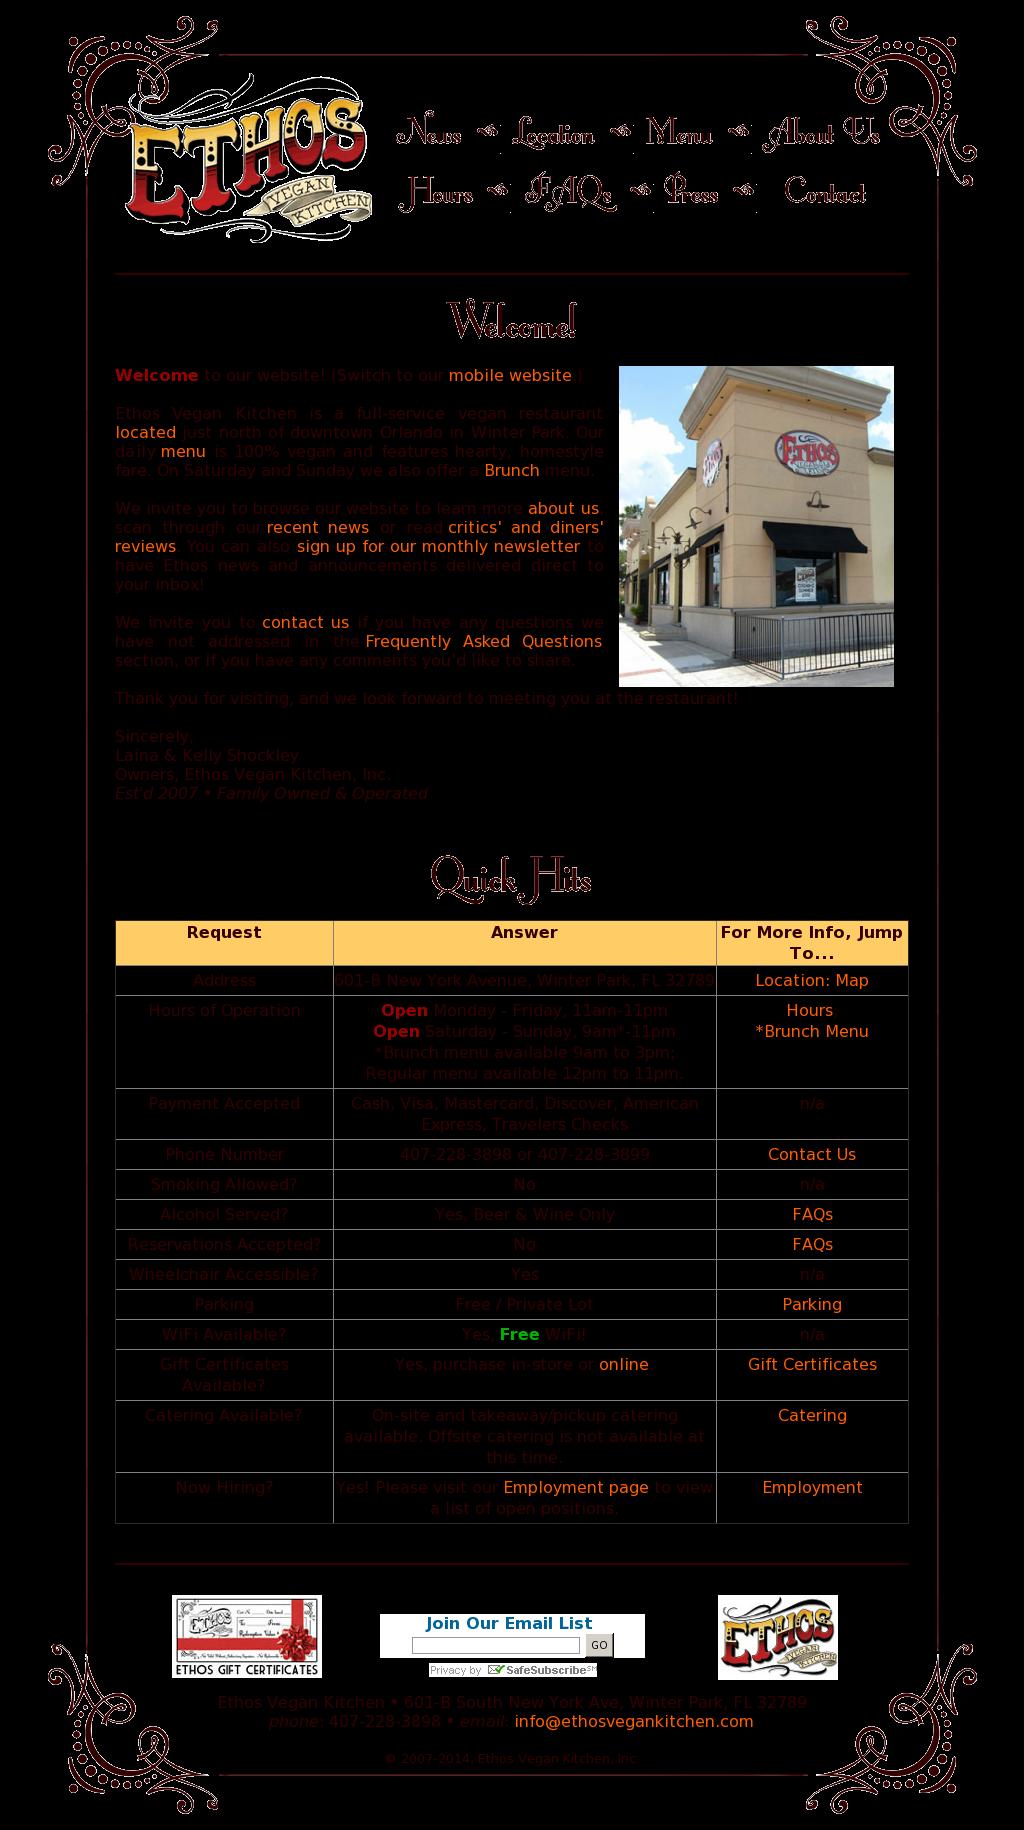 Ethos Vegan Kitchen Company Profile - Revenue, Number of Employees ...